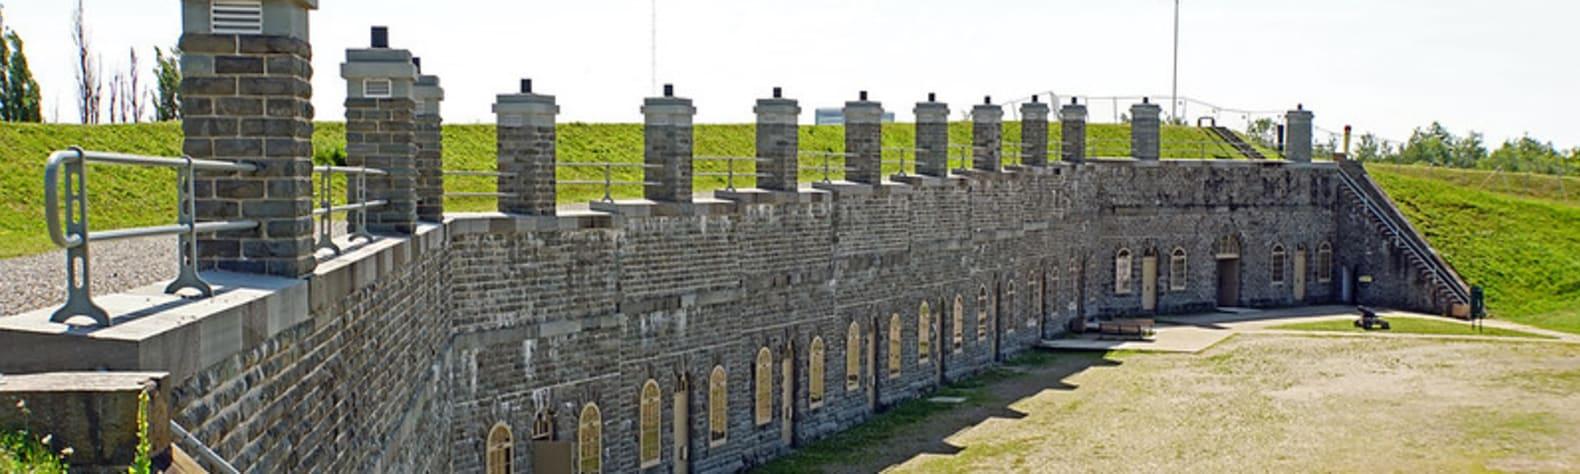 Lévis Forts National Historic Site